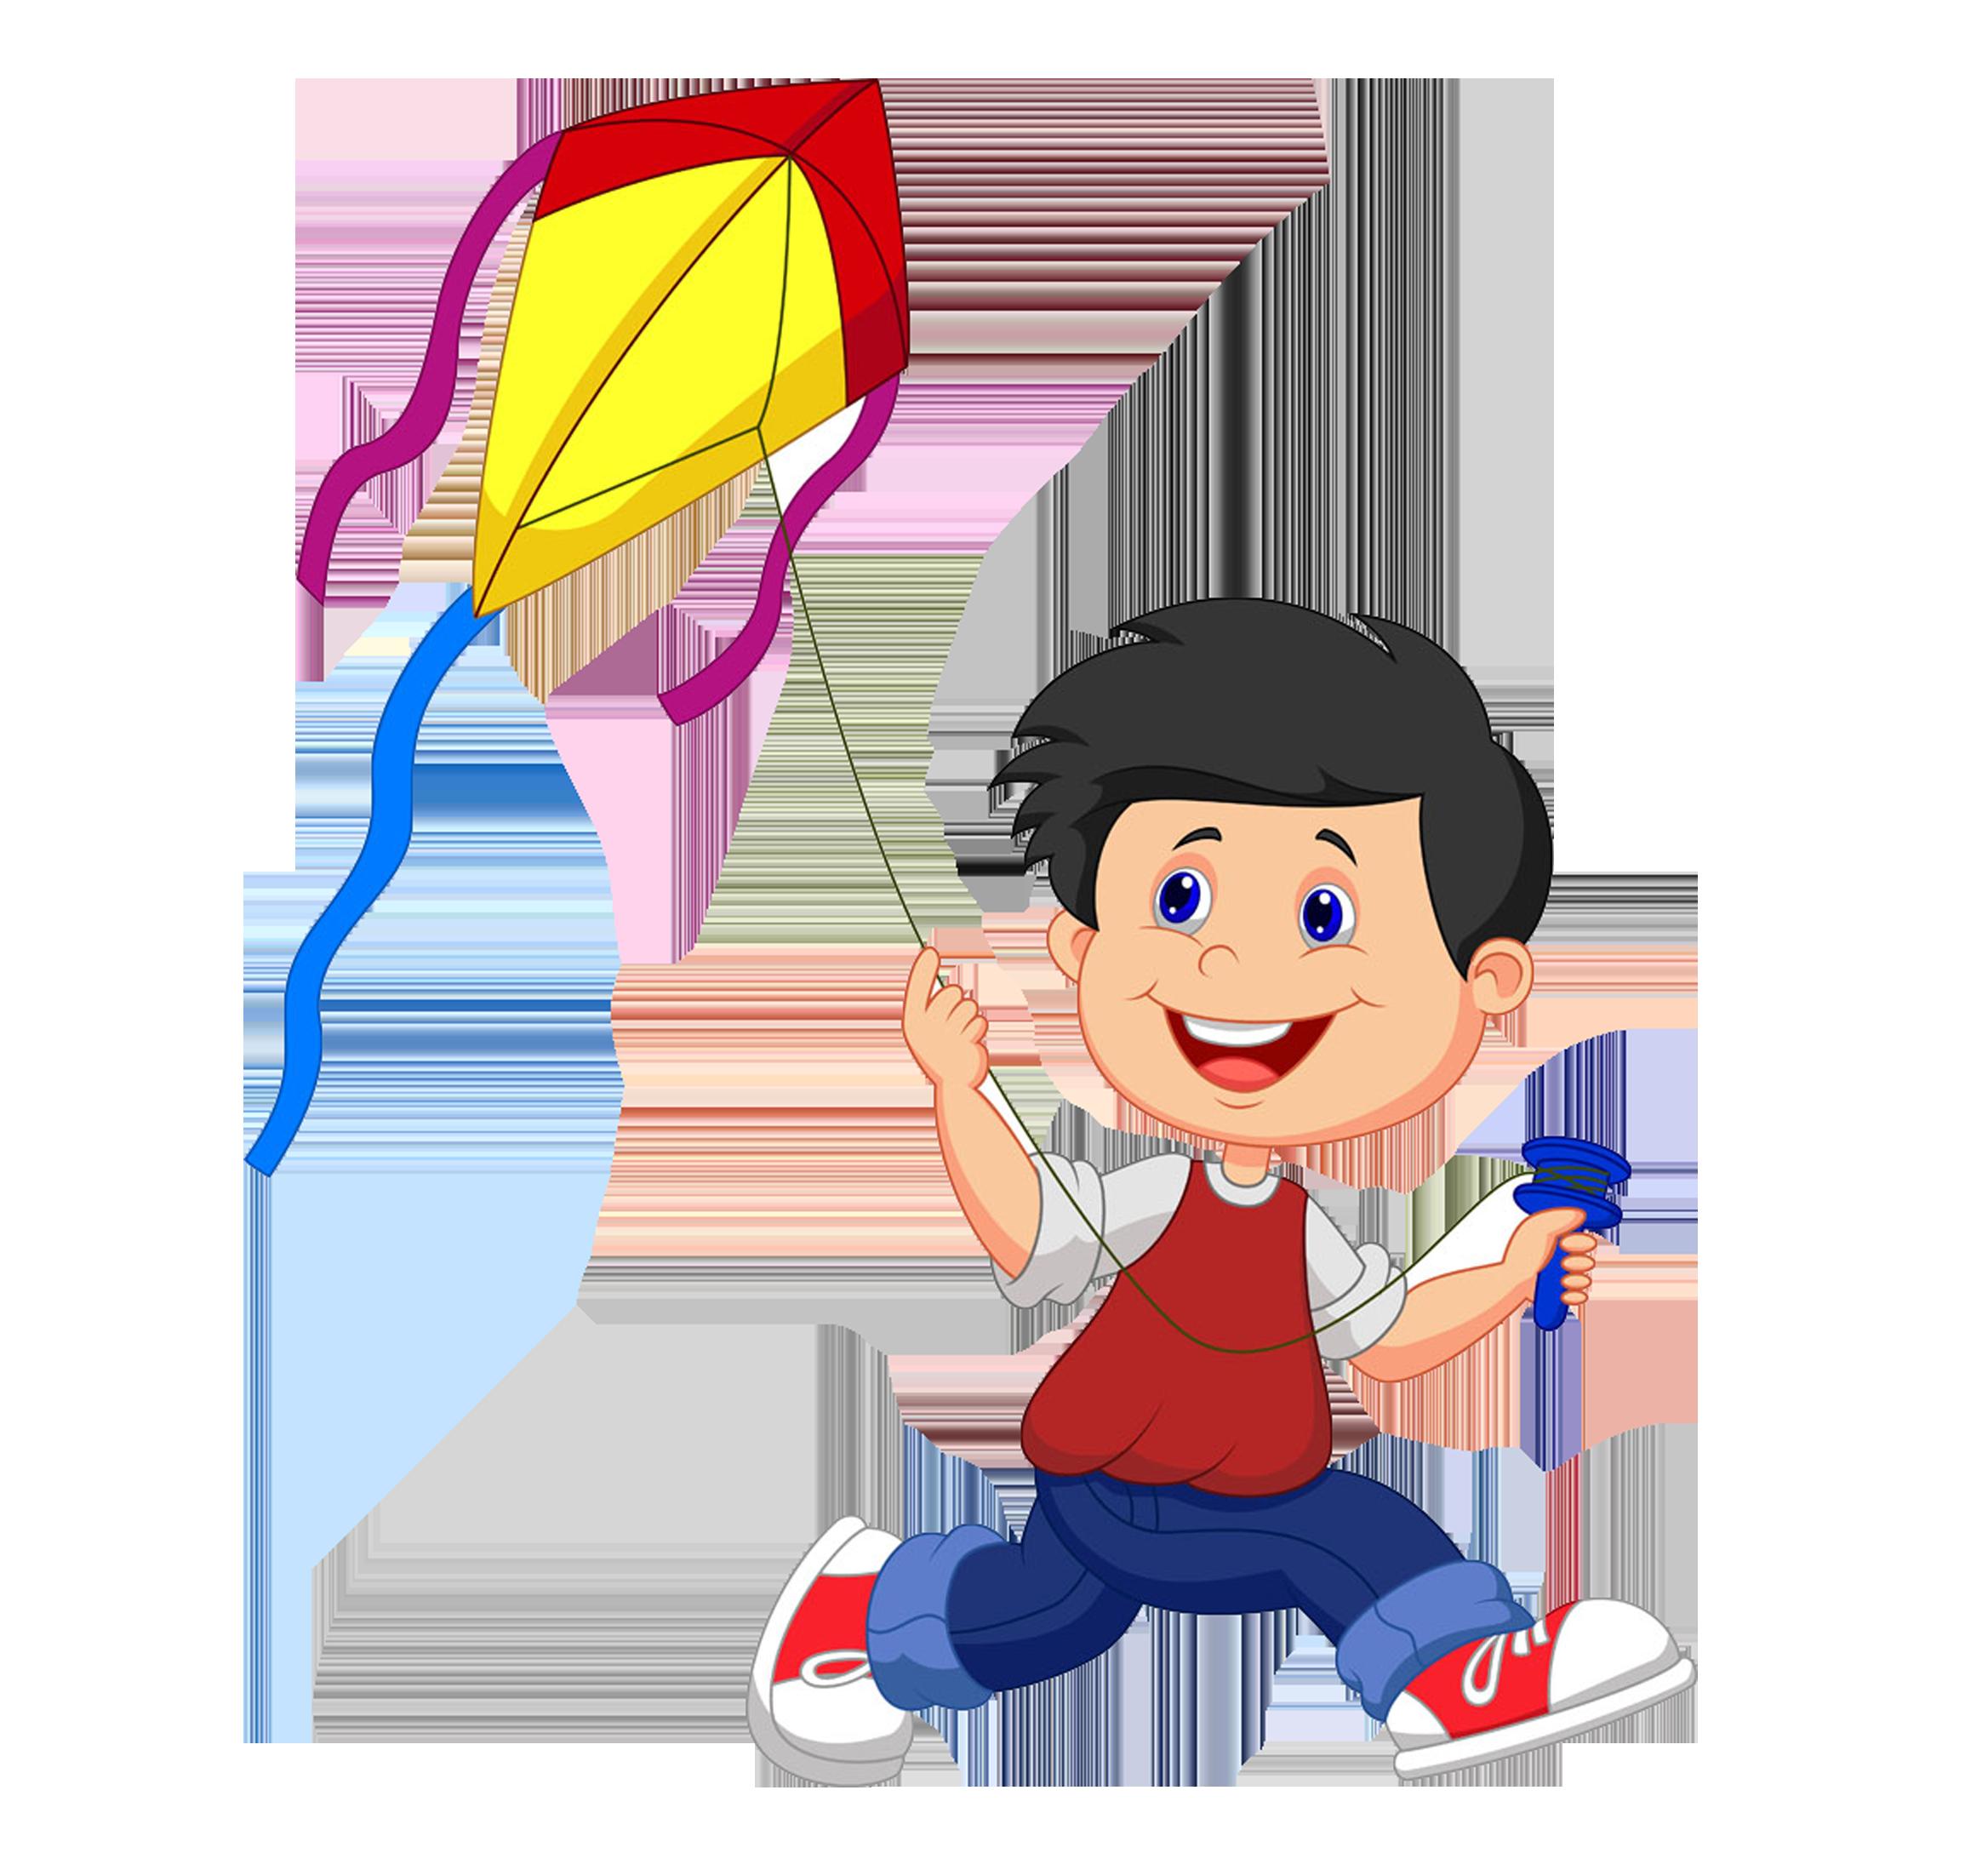 Cartoon illustration small people. Clipart kite kite chinese